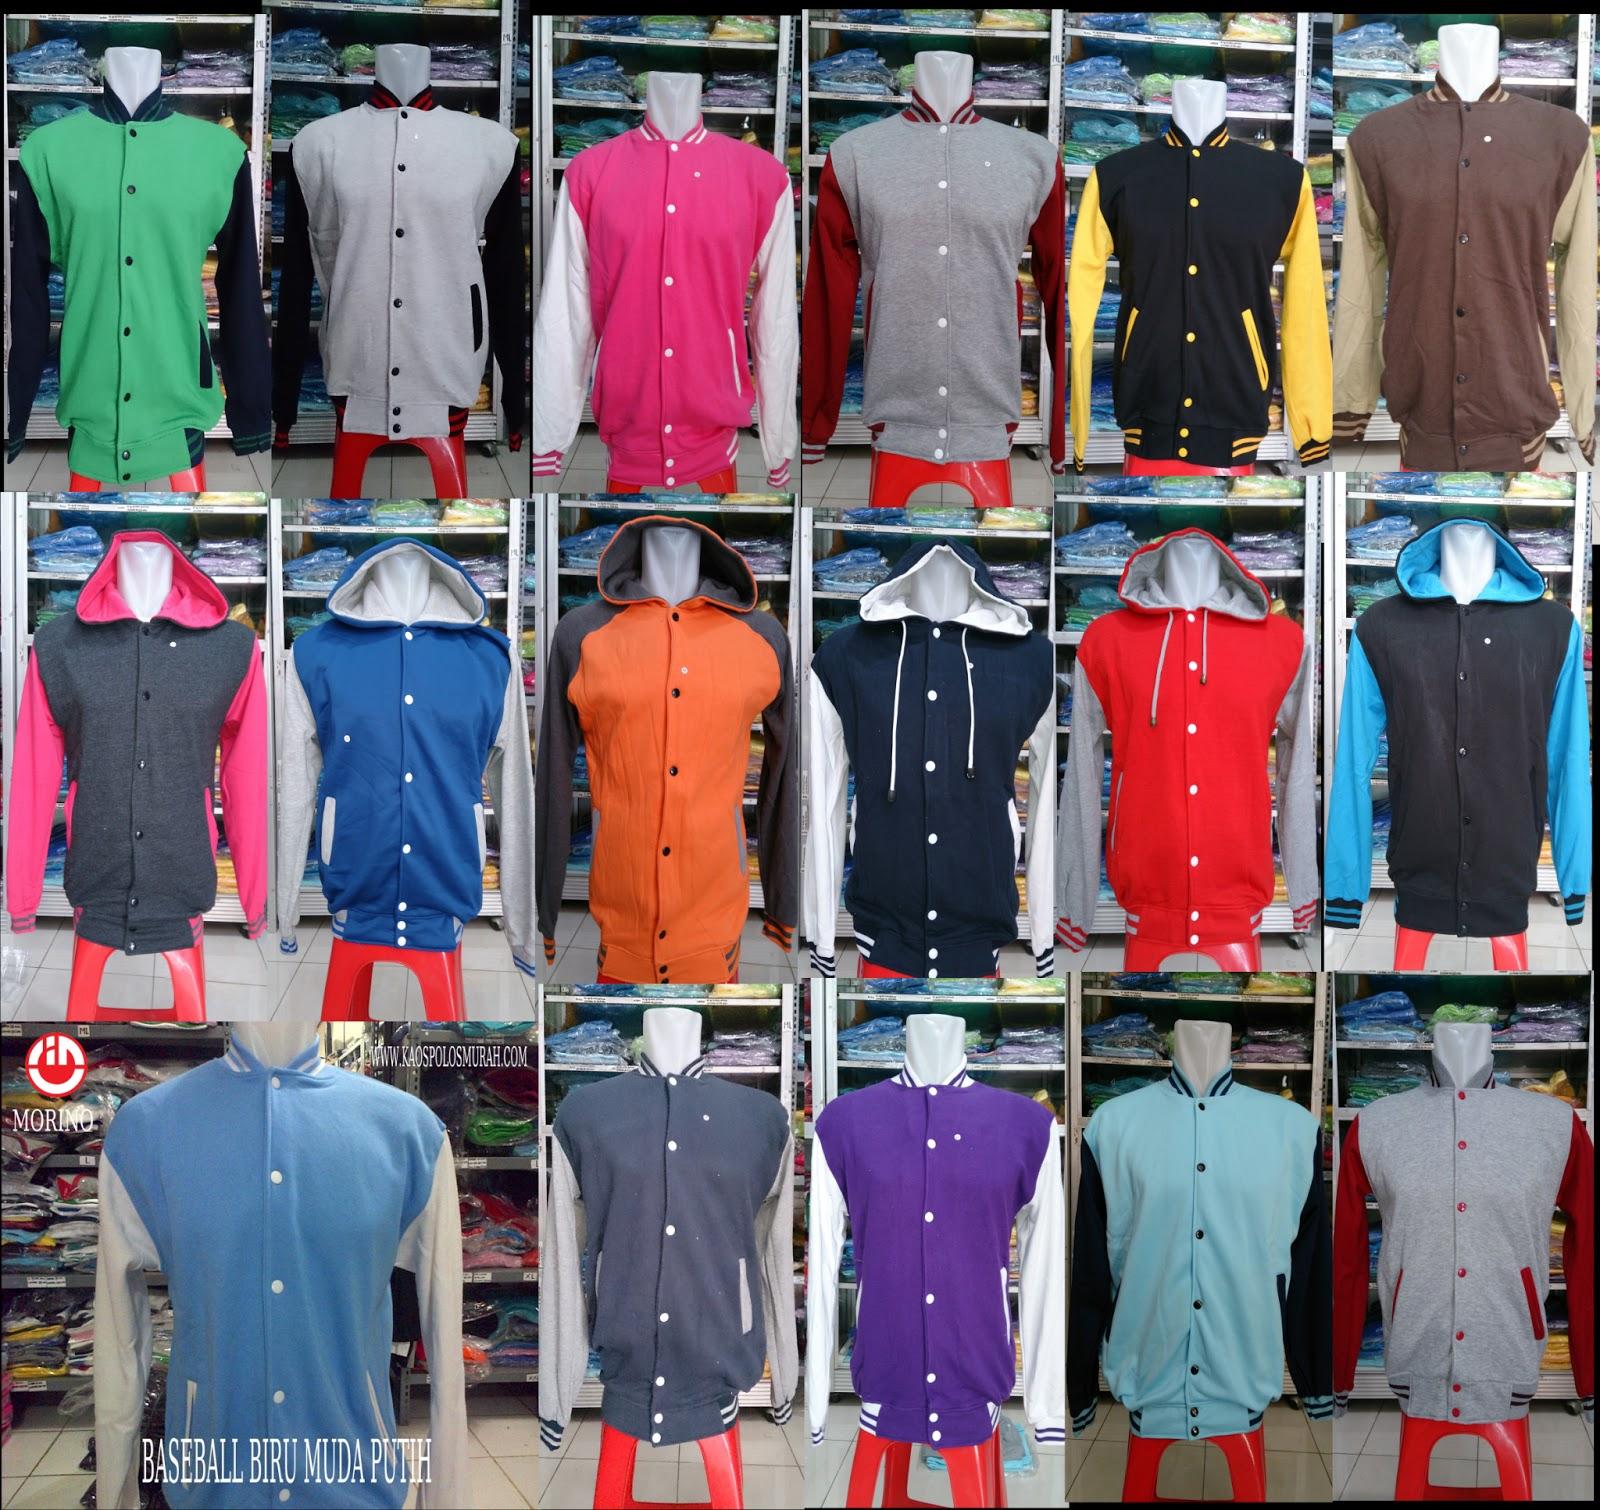 Raja Grosir Kaos Polos Murah Supplier Jual Combed Coklat Cotton 30s Distro Jatinegara Jakarta Timur